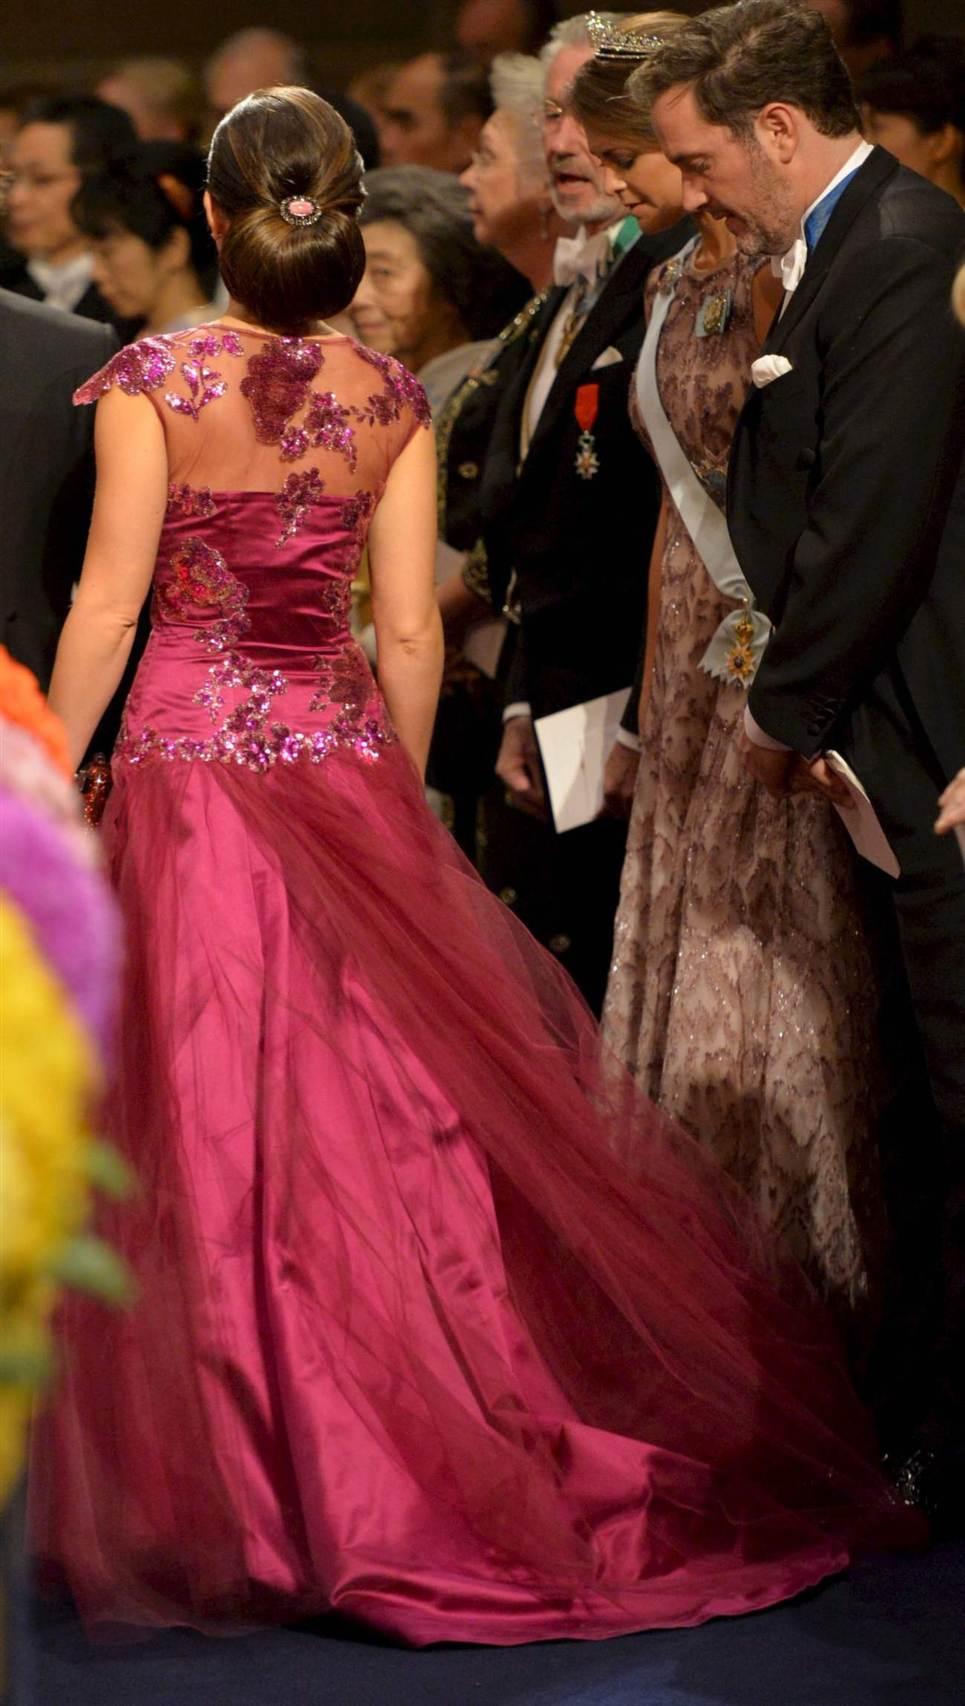 silvia victoria madeleine sofia which swedish royal lady looked